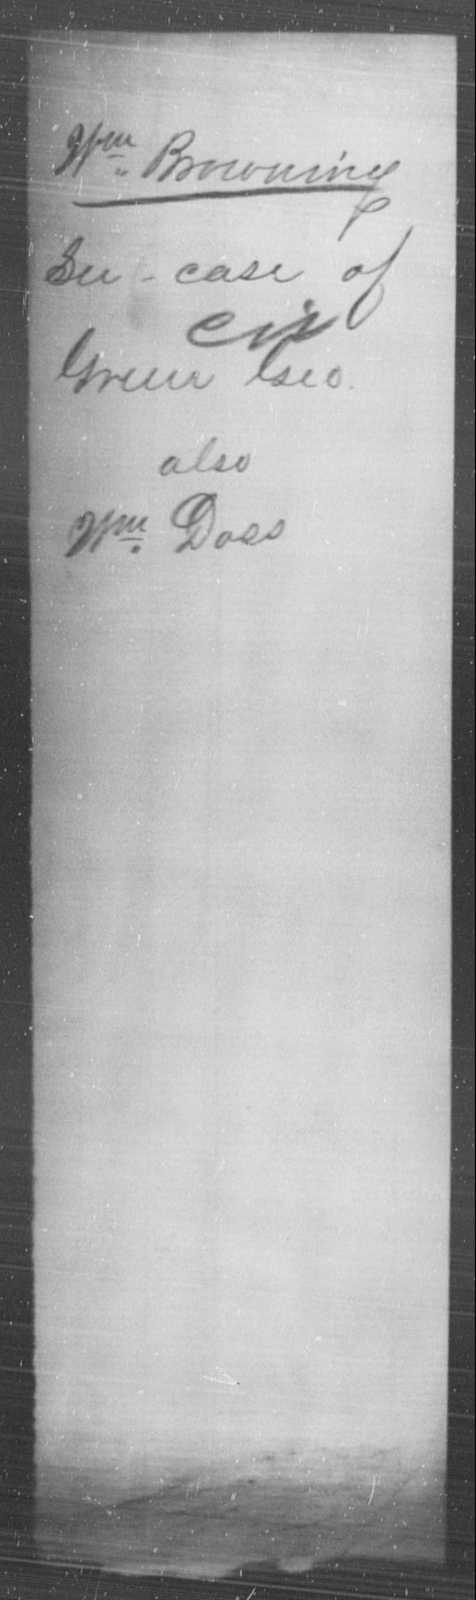 Browning, Wm - State: [Blank] - Year: [Blank]